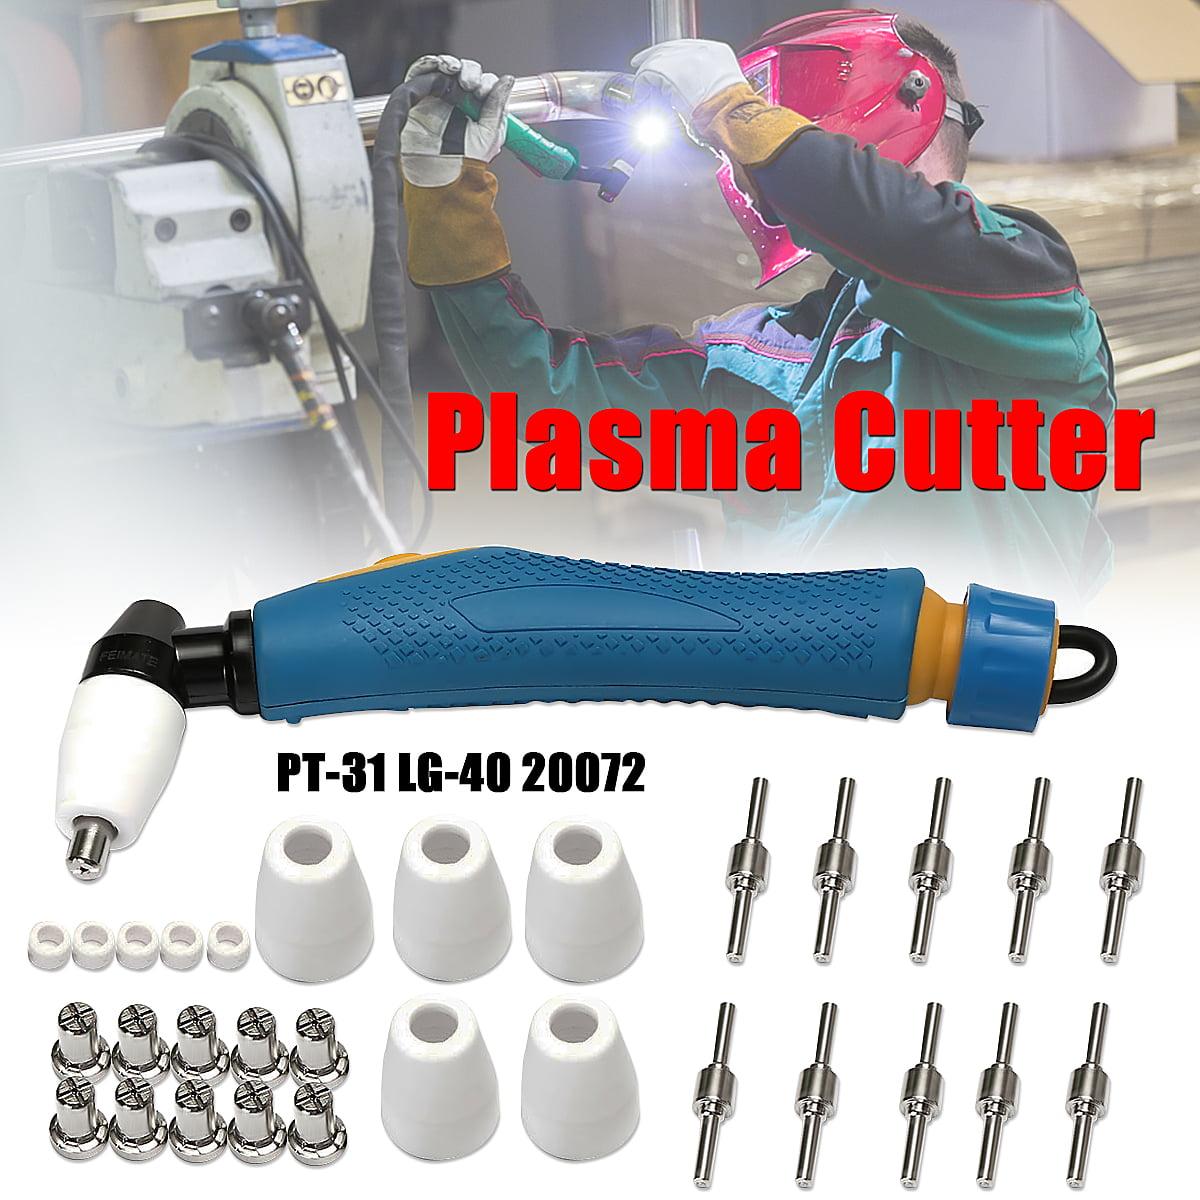 30Pcs PT-31 LG-40 20072 Air Plasma Cutter Cuttting Torch Head Body & Electrode Tip Nozzle US